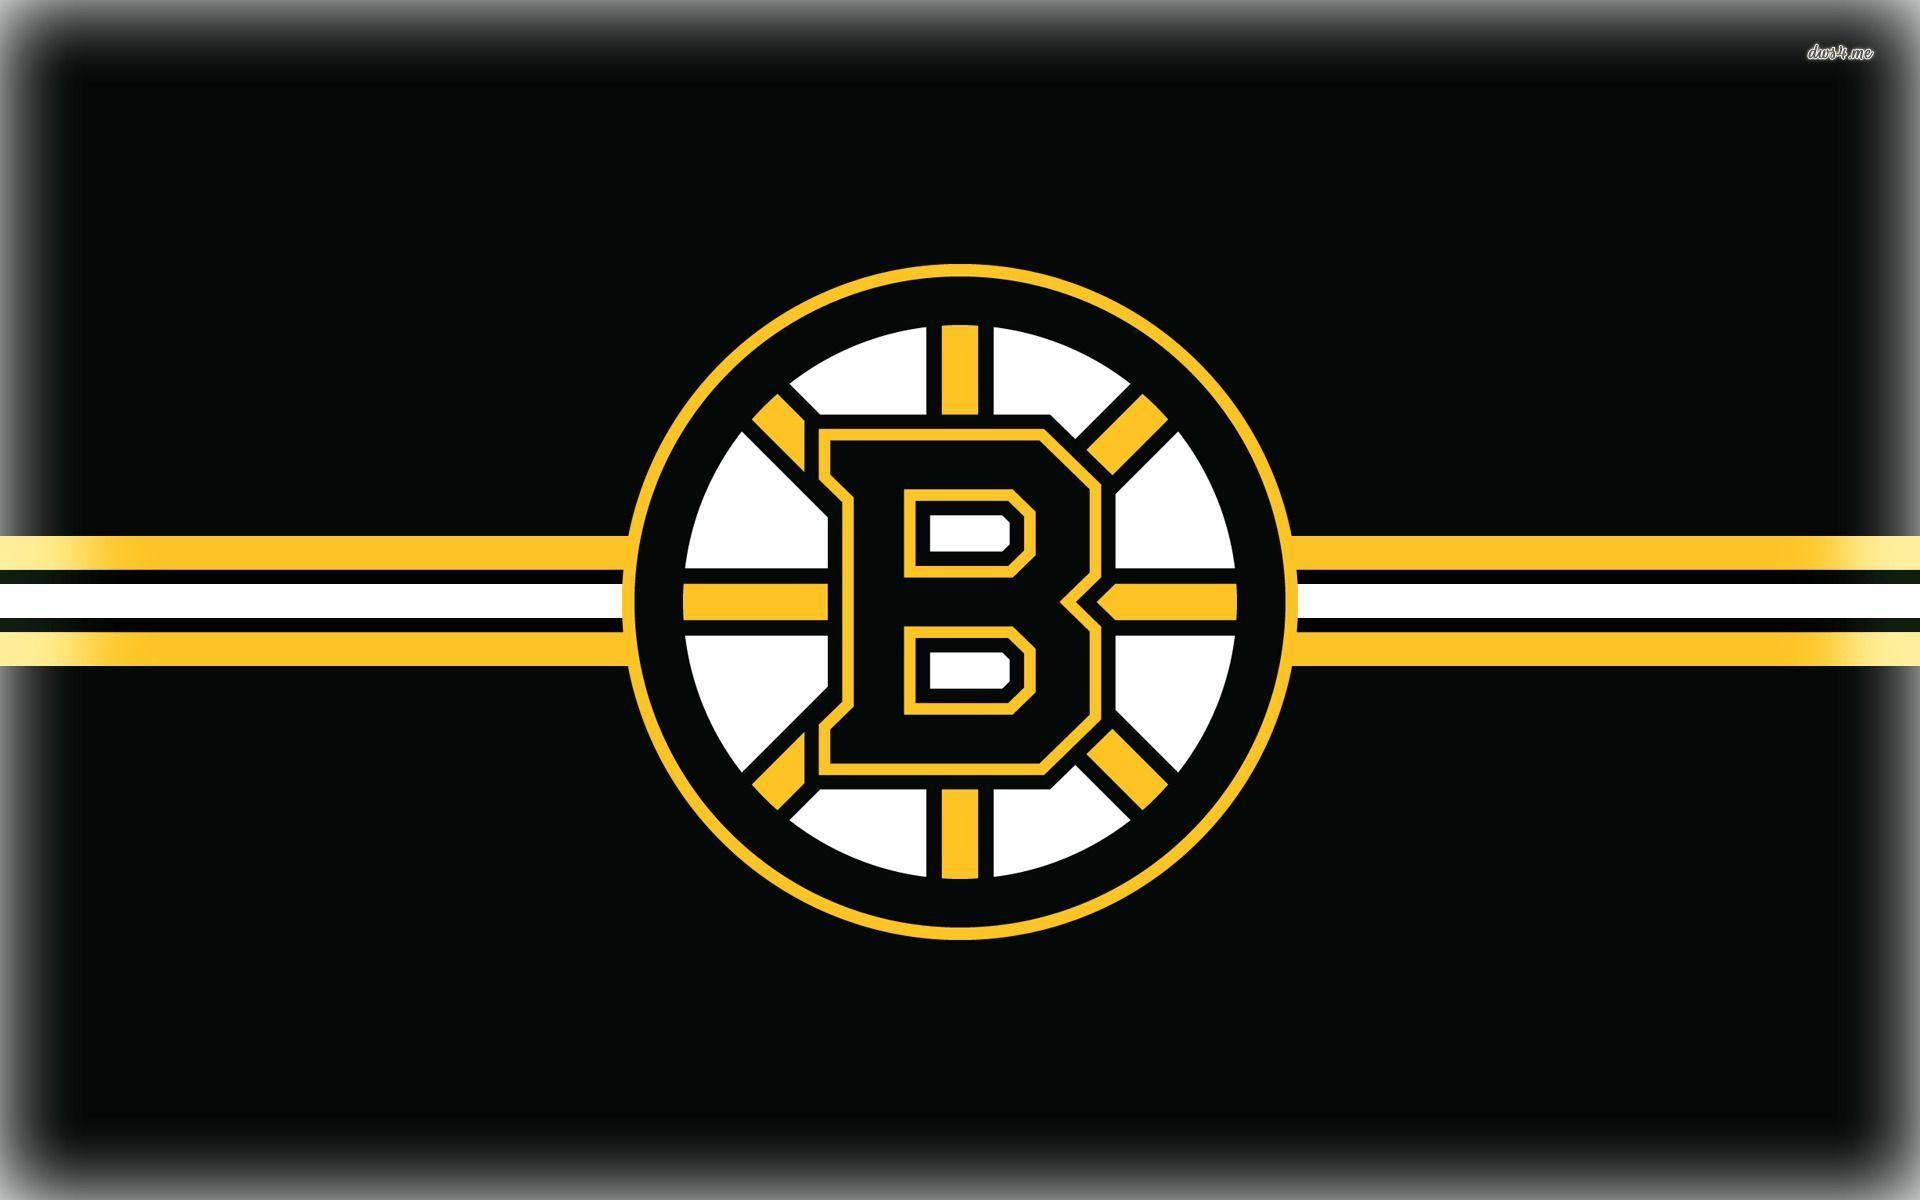 Boston Bruins Wallpapers – Full HD wallpaper search